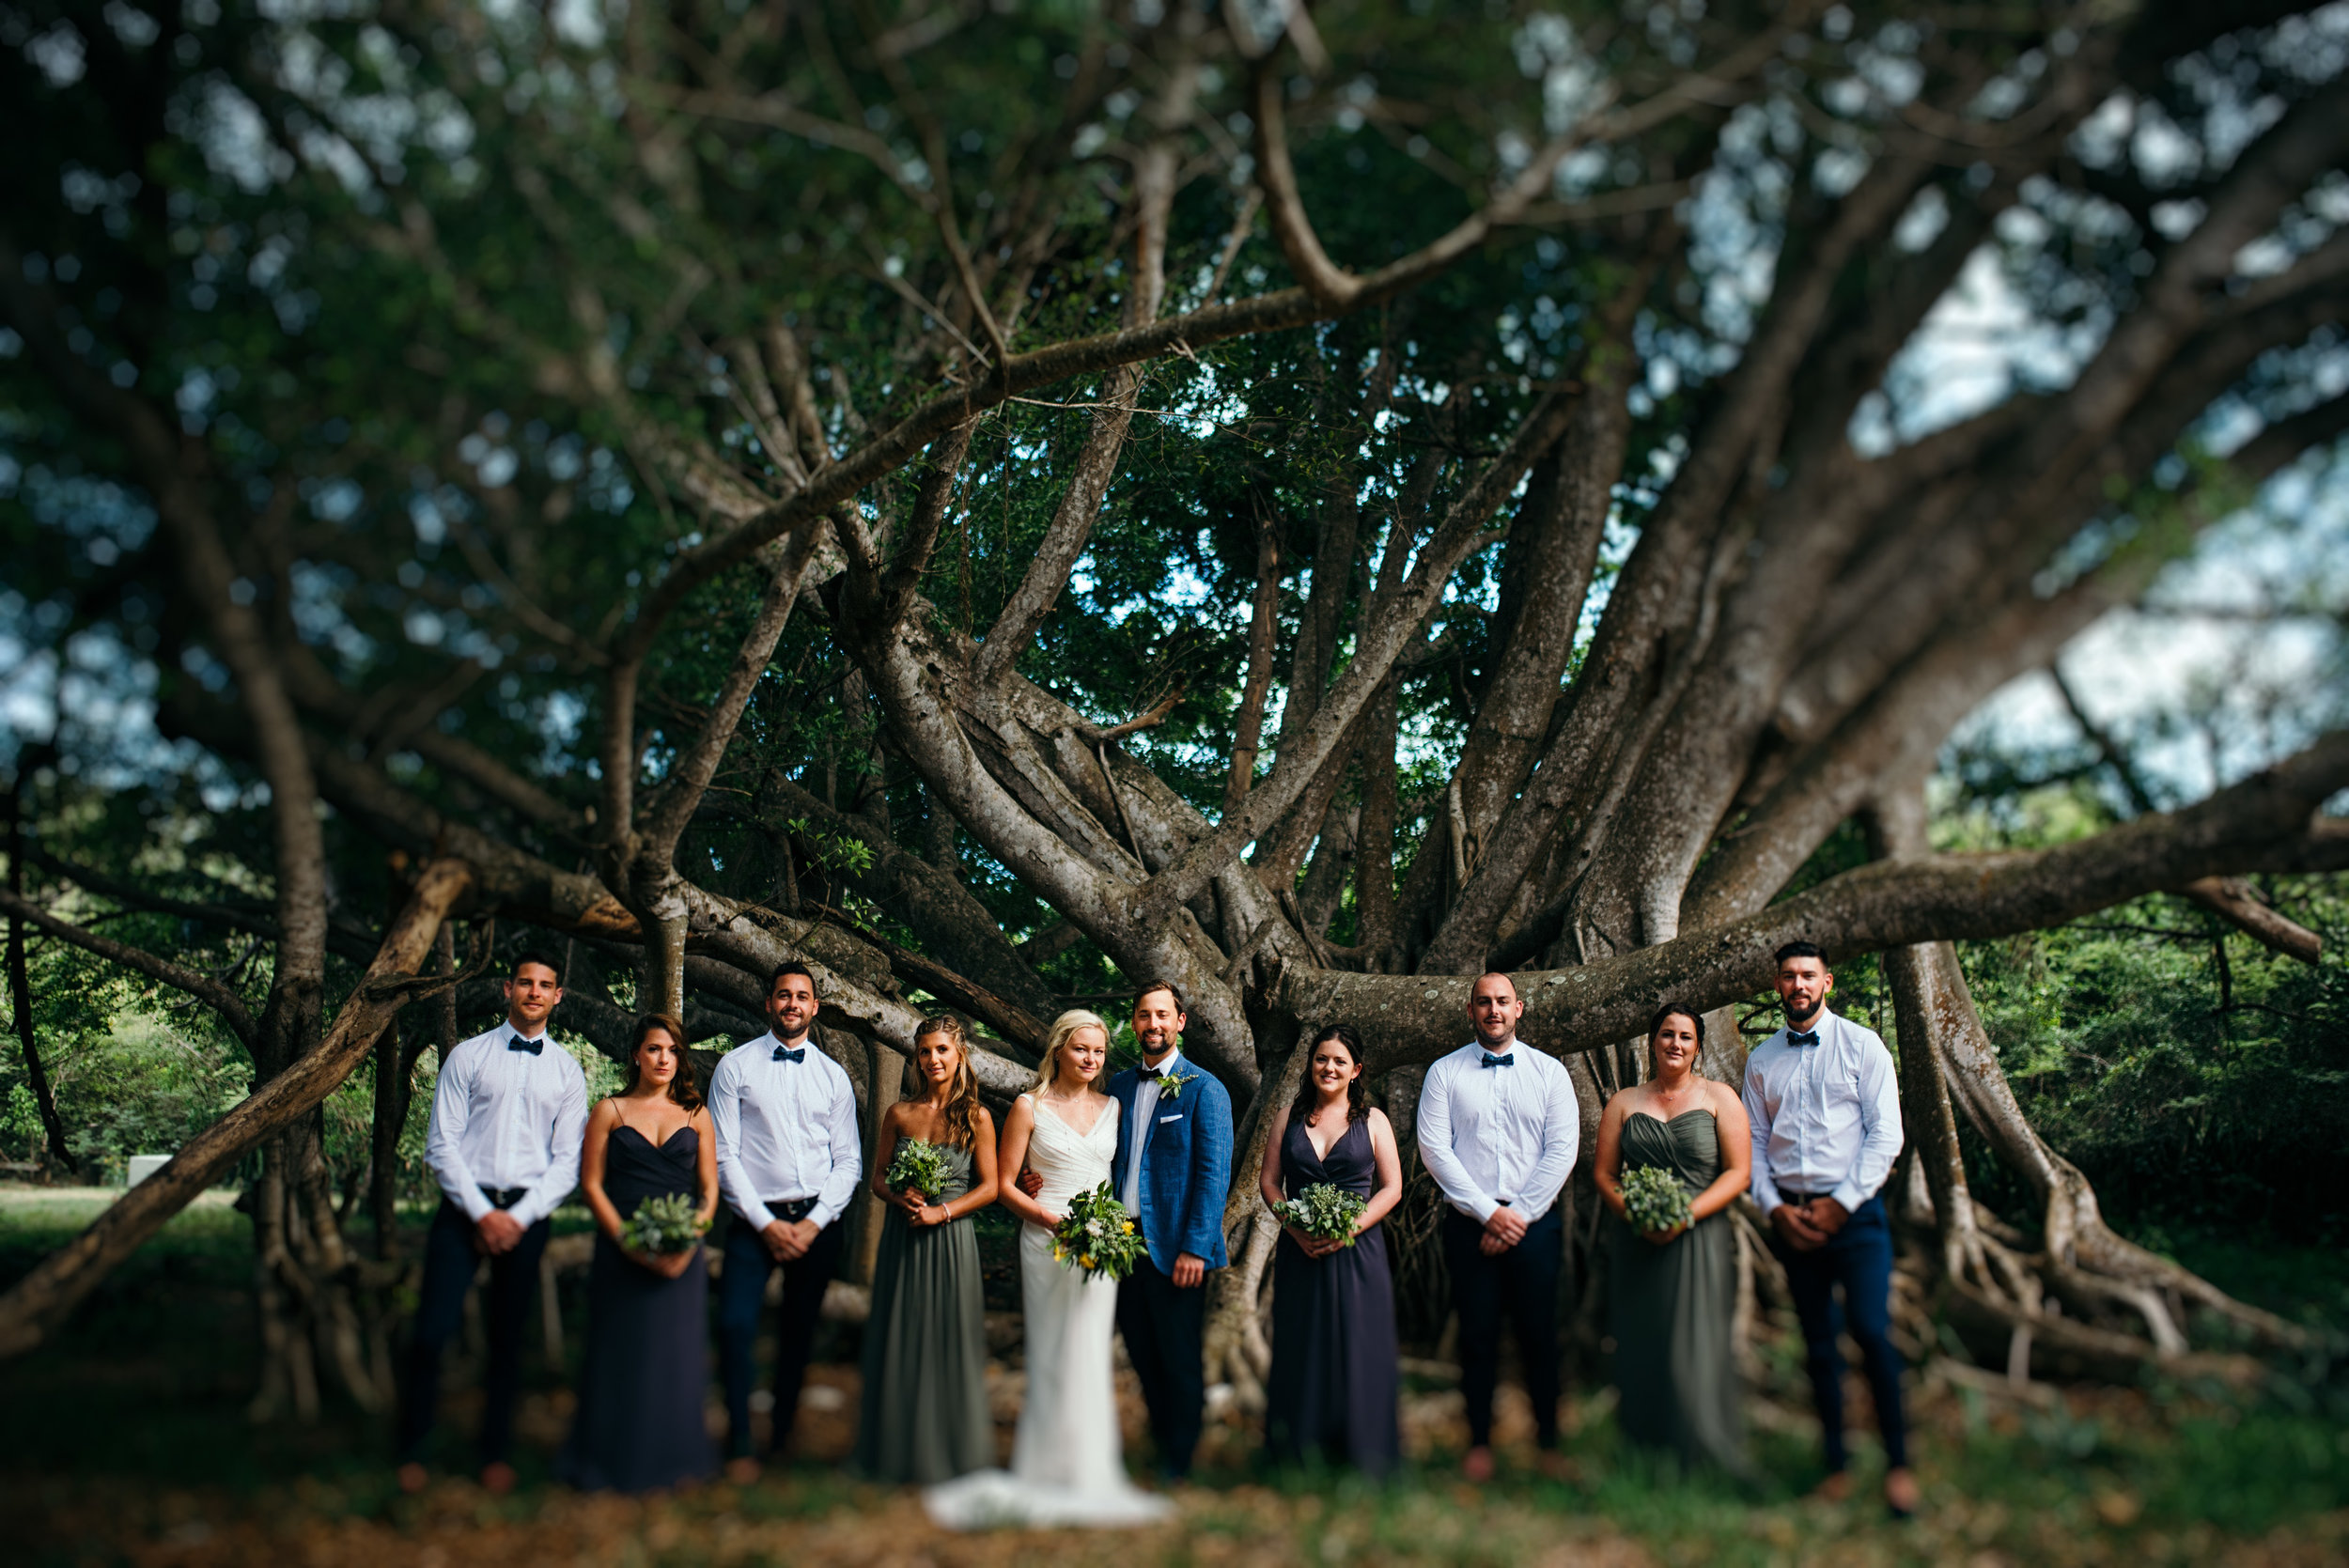 Slaight_Smith_Wedding_May_2016_3327-Edit-2.jpg